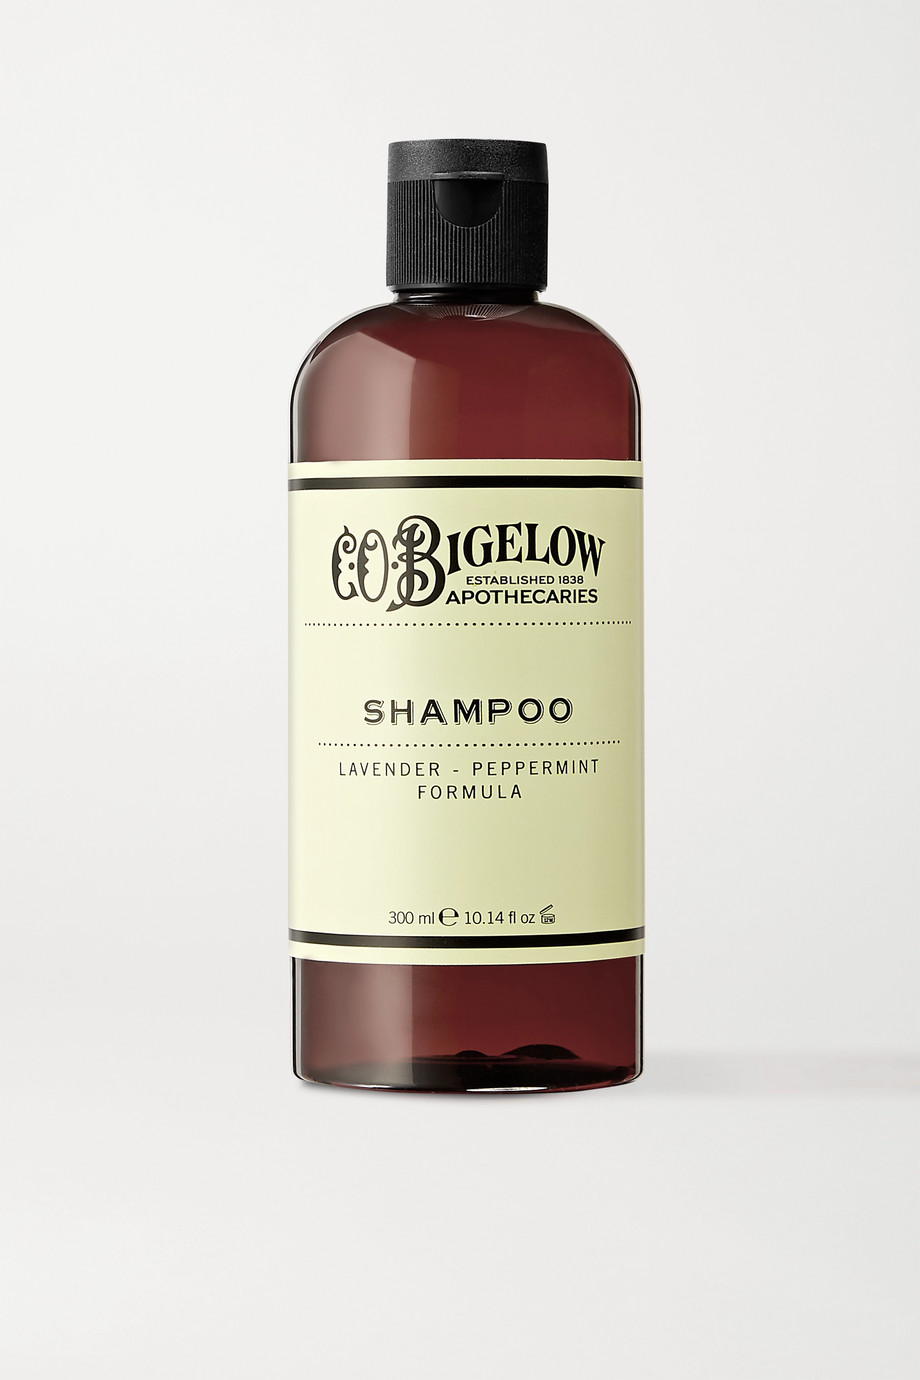 C.O. Bigelow Lavender Peppermint Shampoo, 300ml